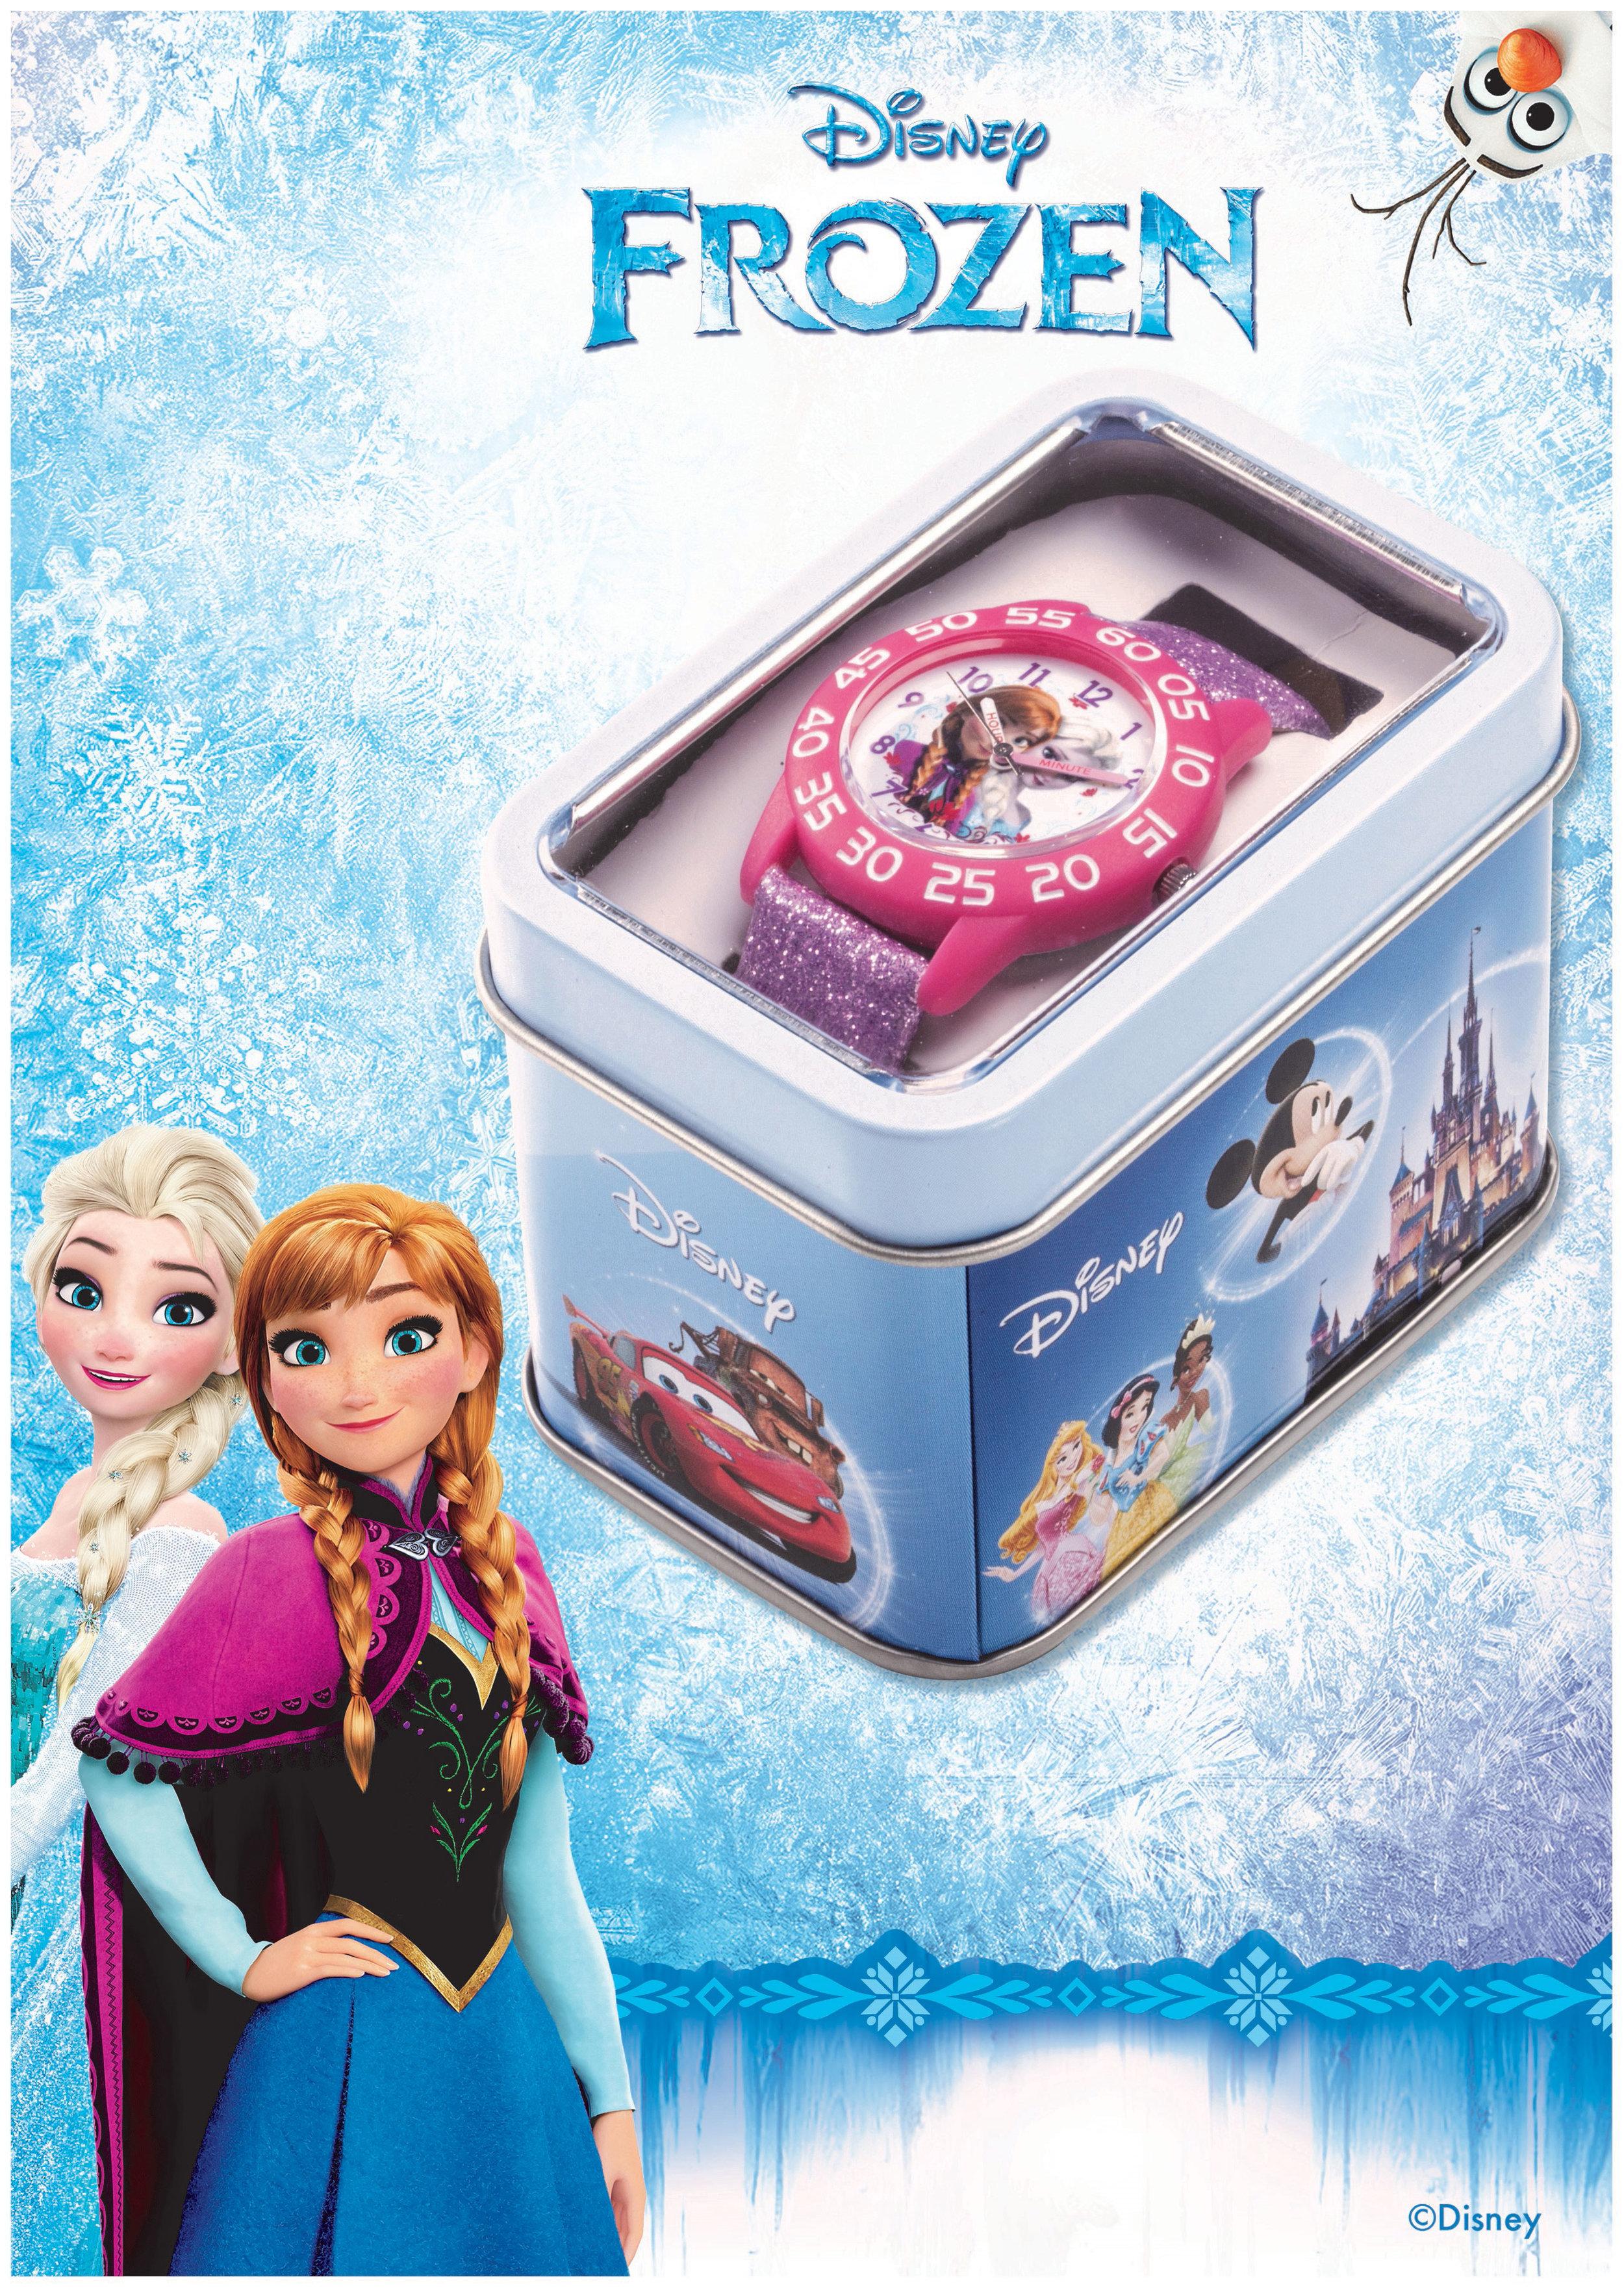 frozen-advert1_scorpio-worldwide_travel-retail-distributor